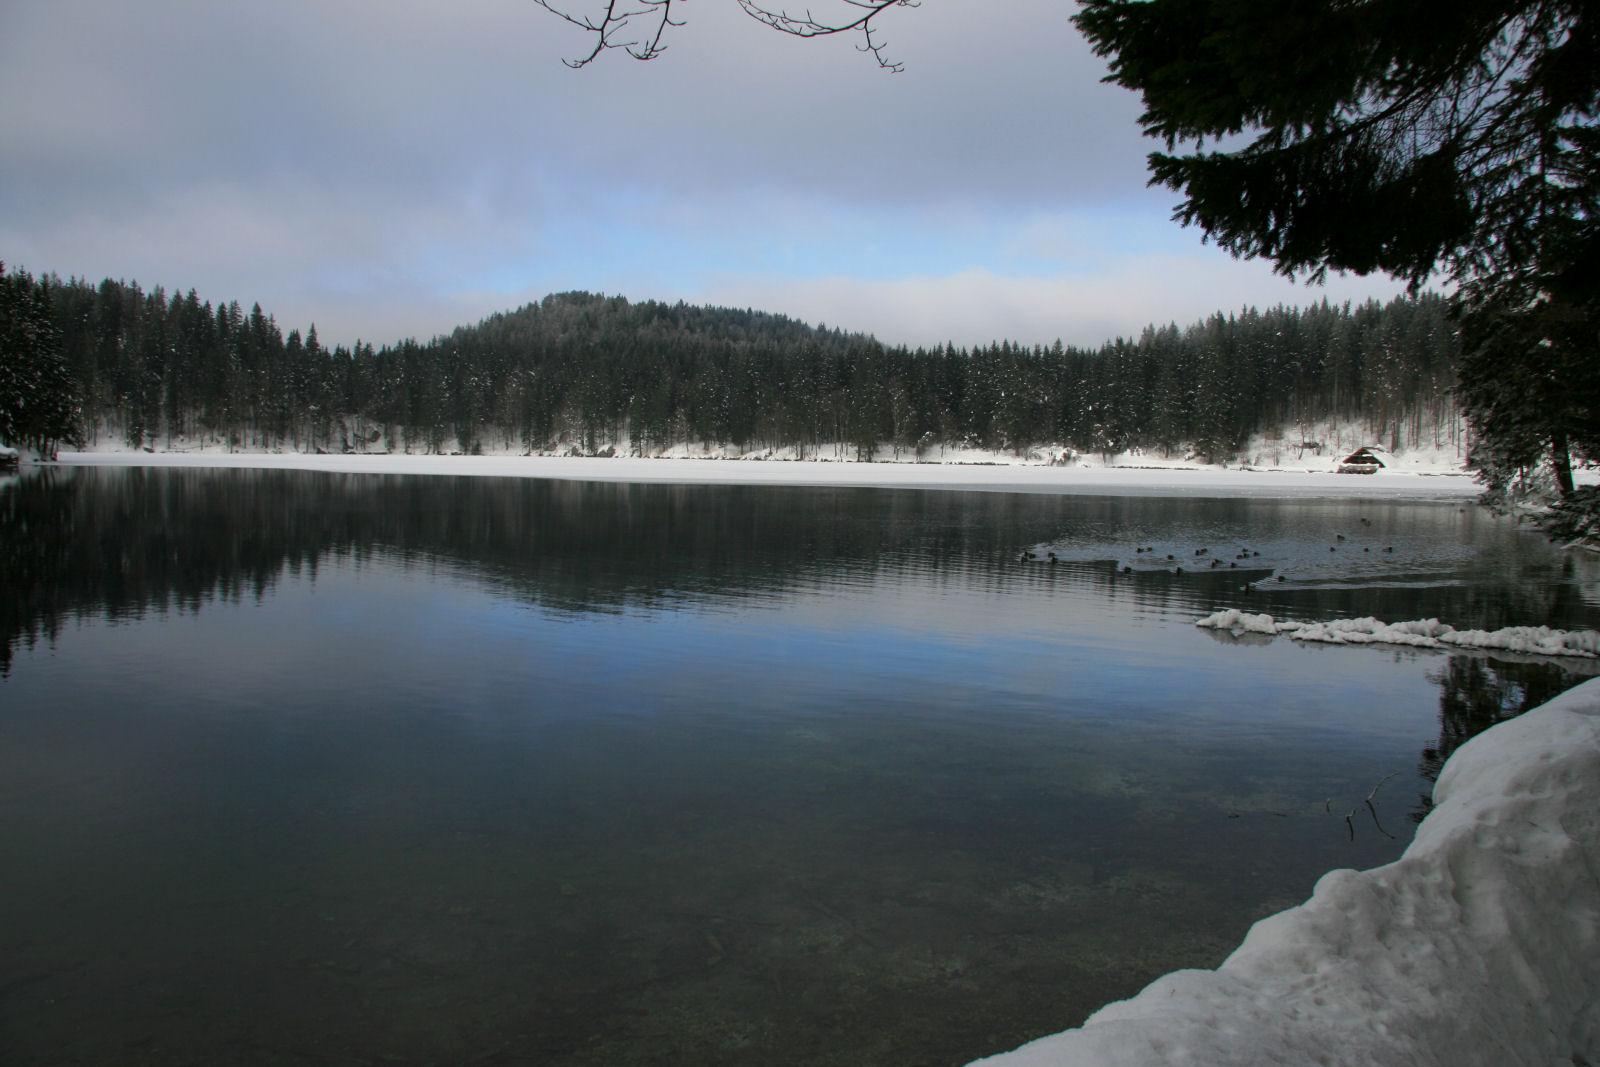 fusine-lakes-winter-02-italy